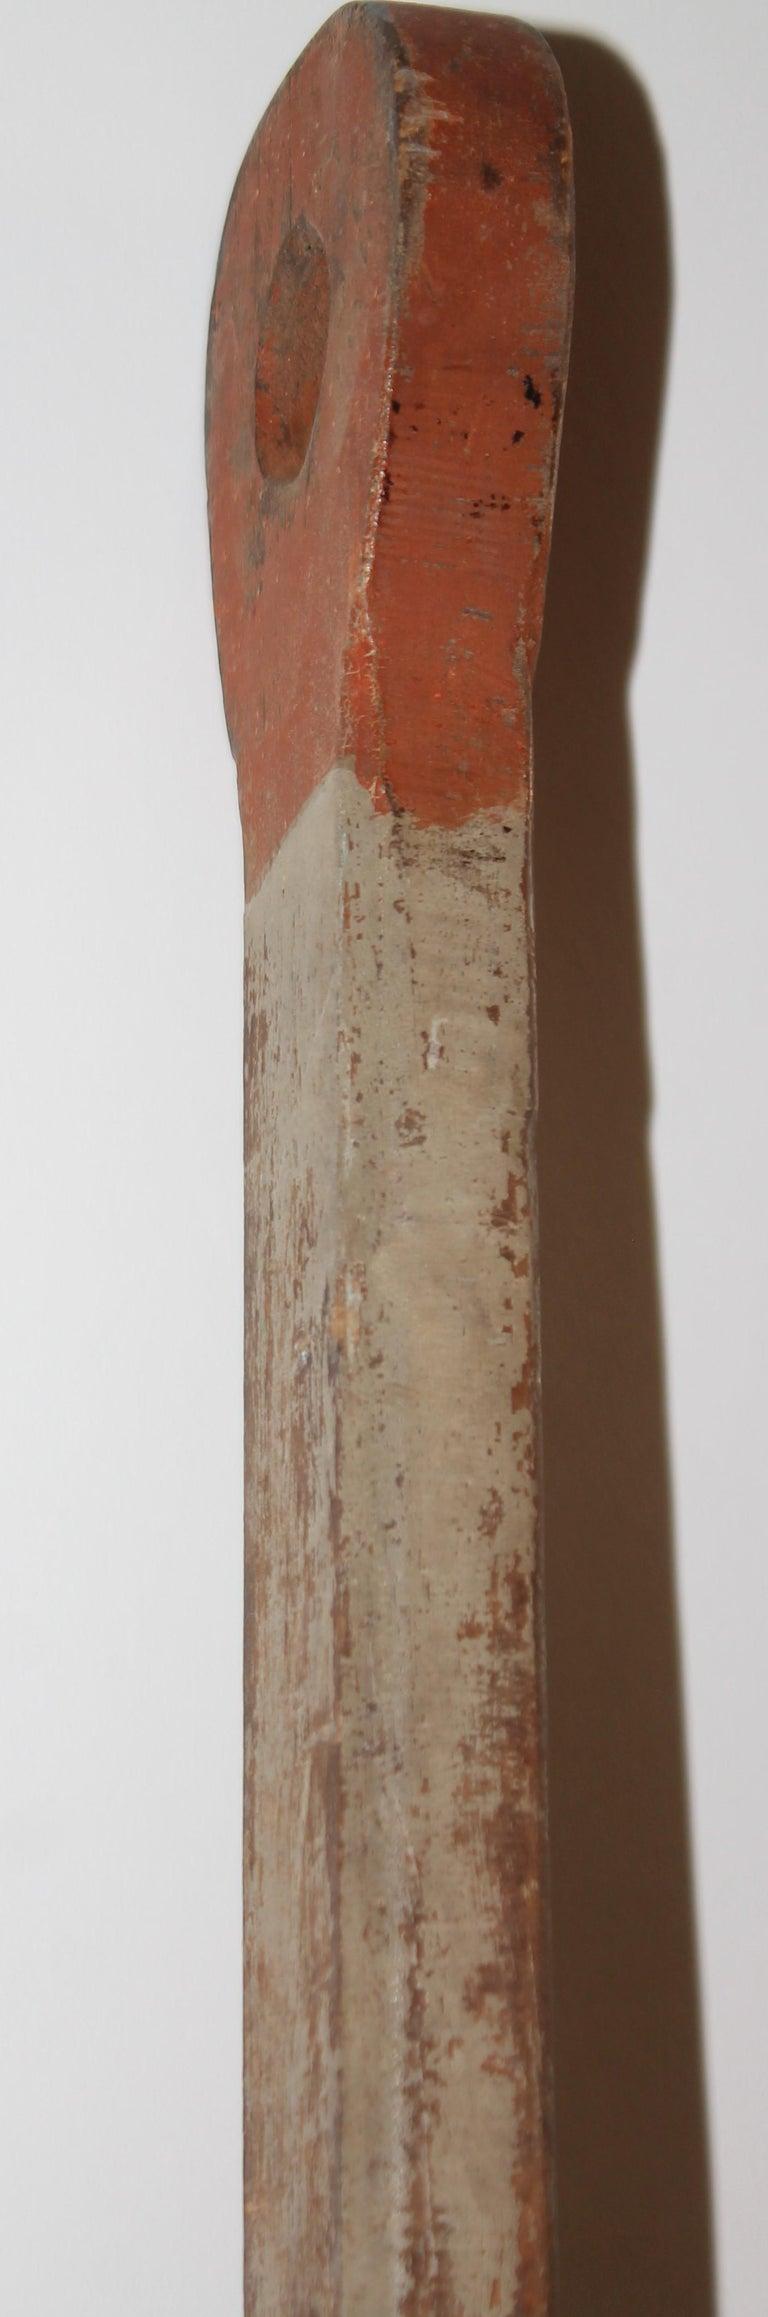 19th Century 19thc Original Painted White & Orange Paddle For Sale